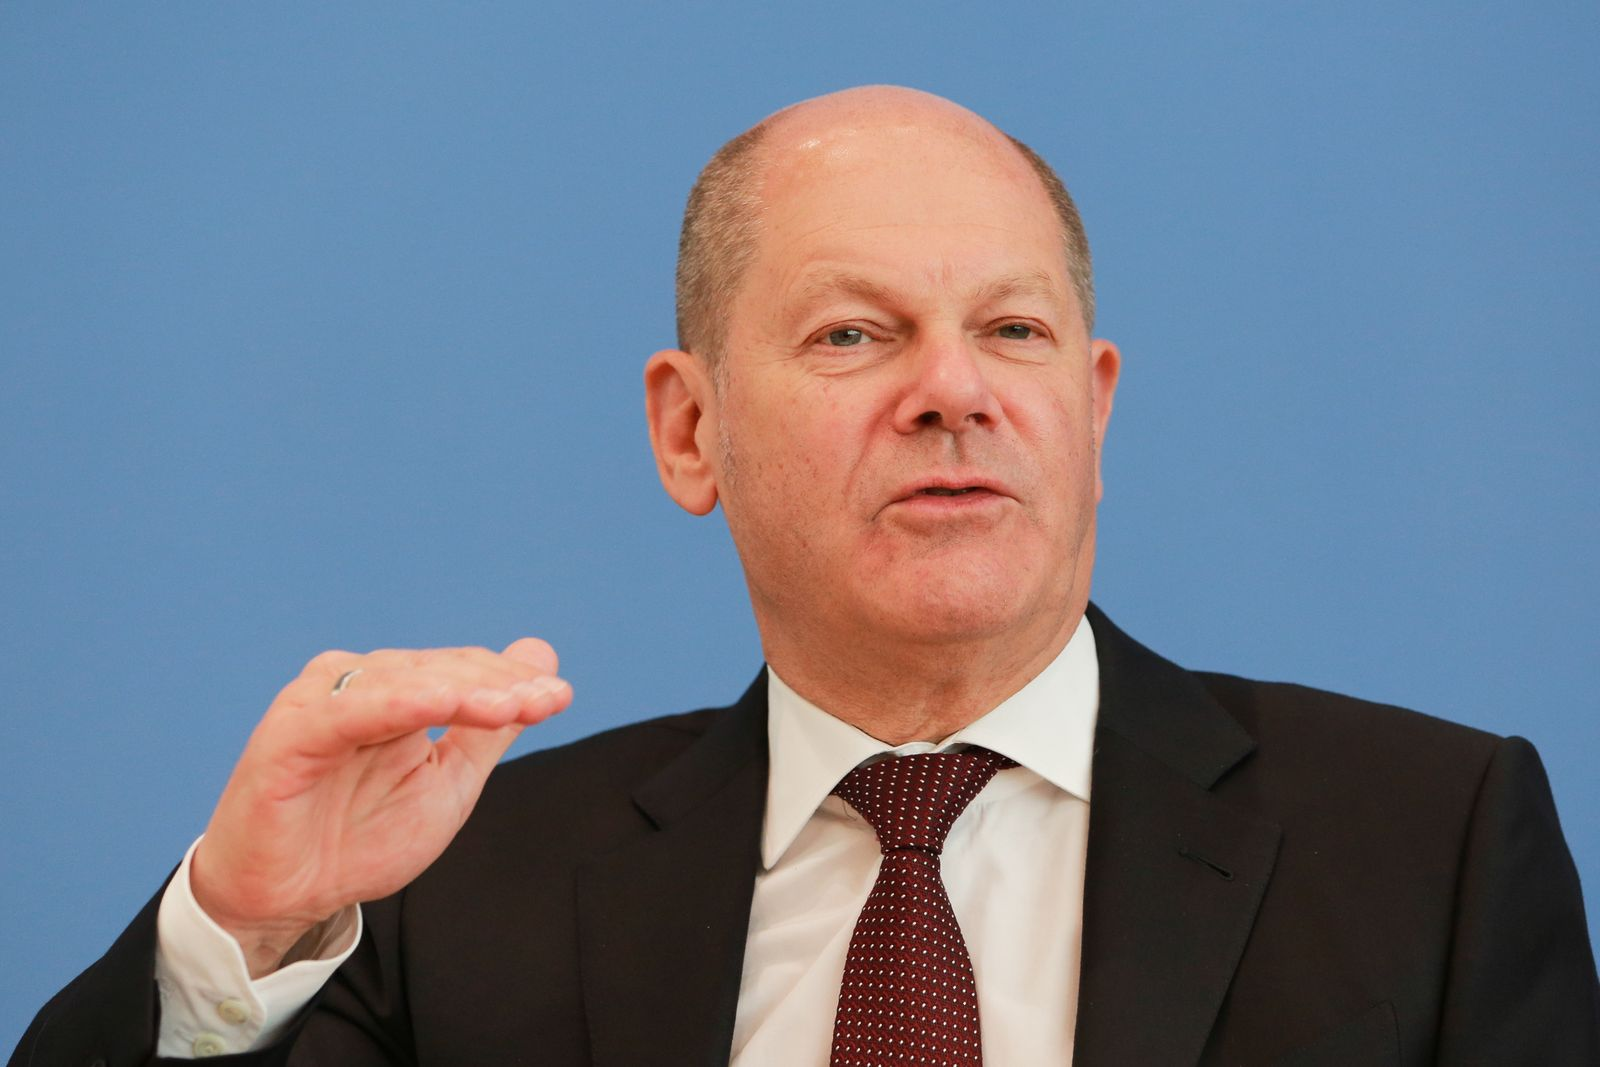 Finance Minister Scholz Announces Tax Revenue Predictions During The Coronavirus Crisis